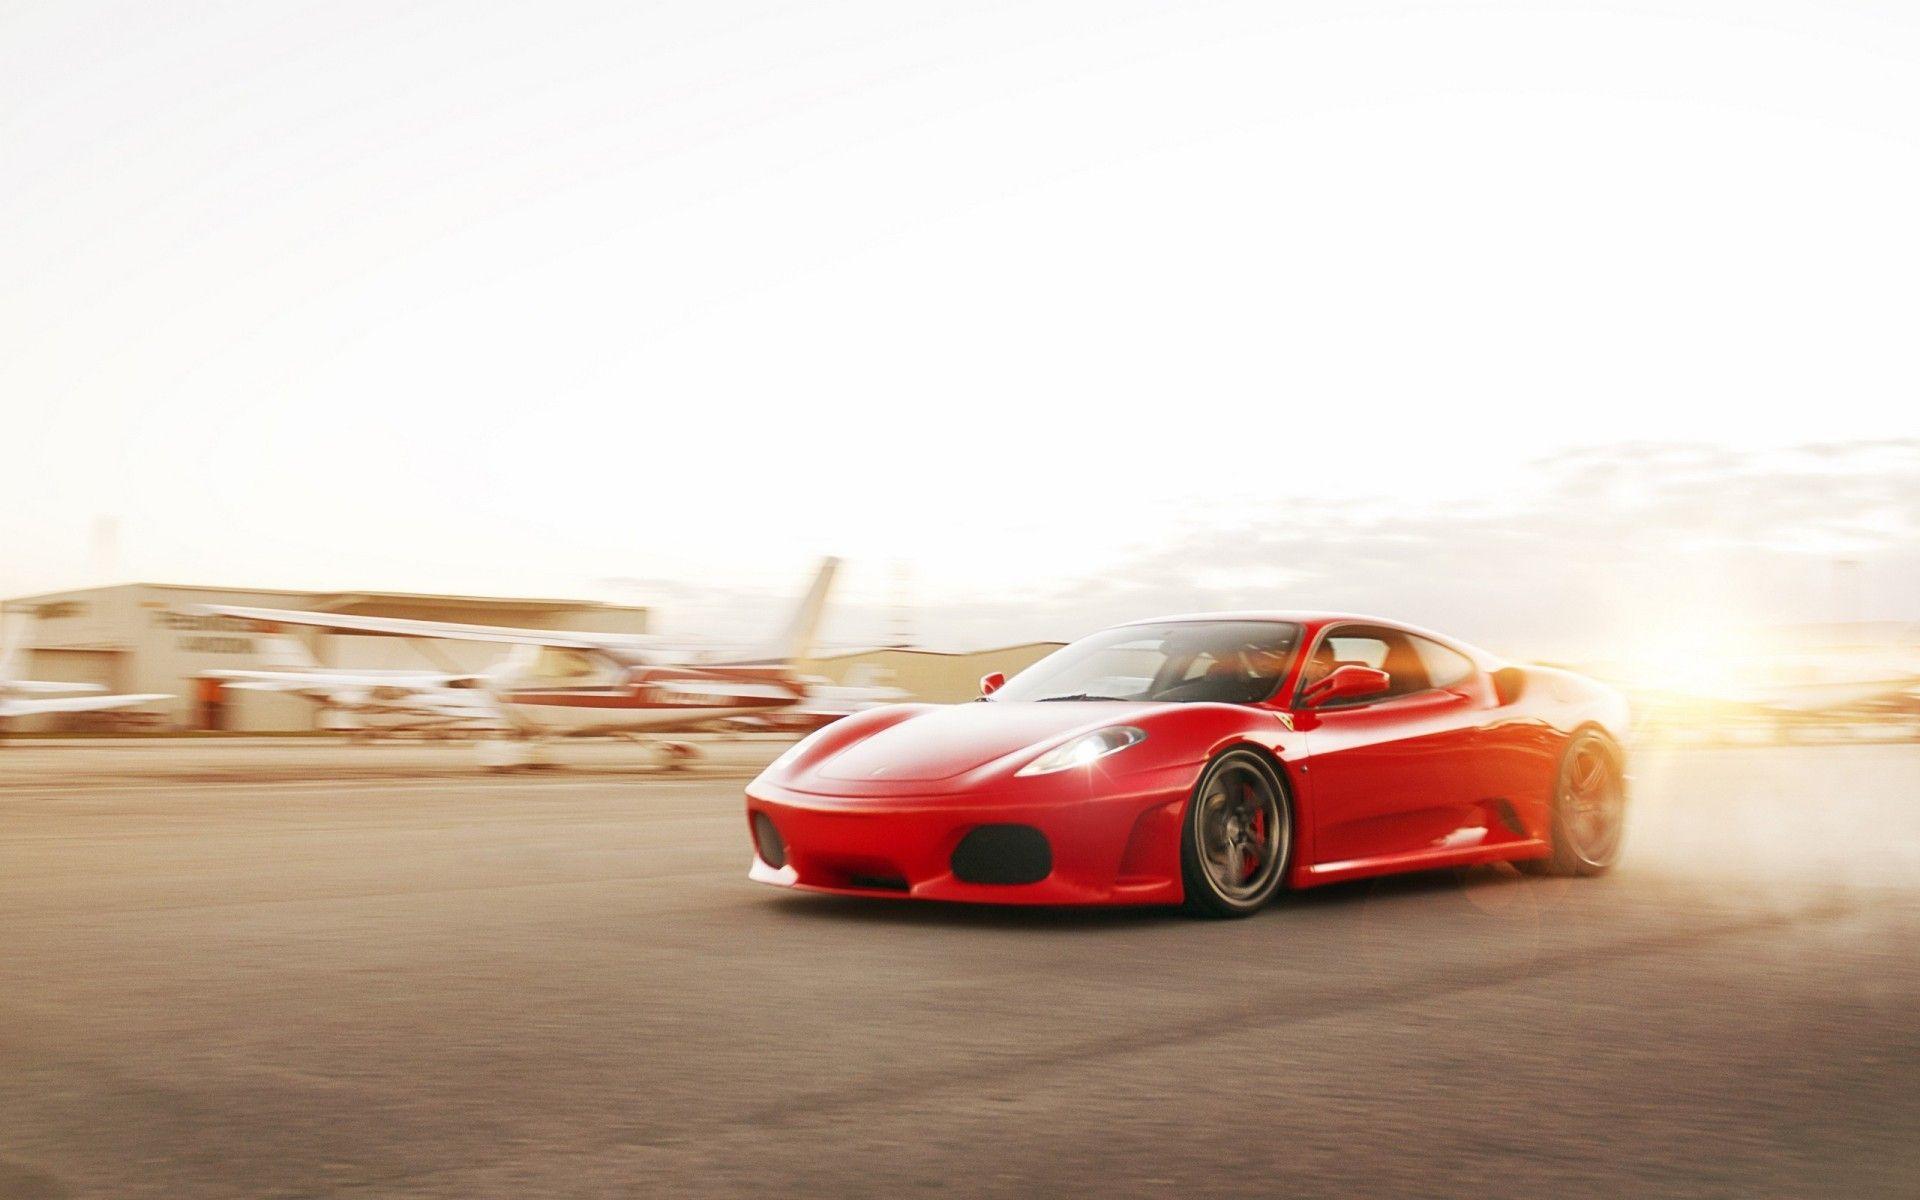 Ferrari F430 Ferrari Red Cars Roads Sunlights Supercars Wallpaper Zumxs06ksw Ipad Air Wallpaper Ferrari Super Cars